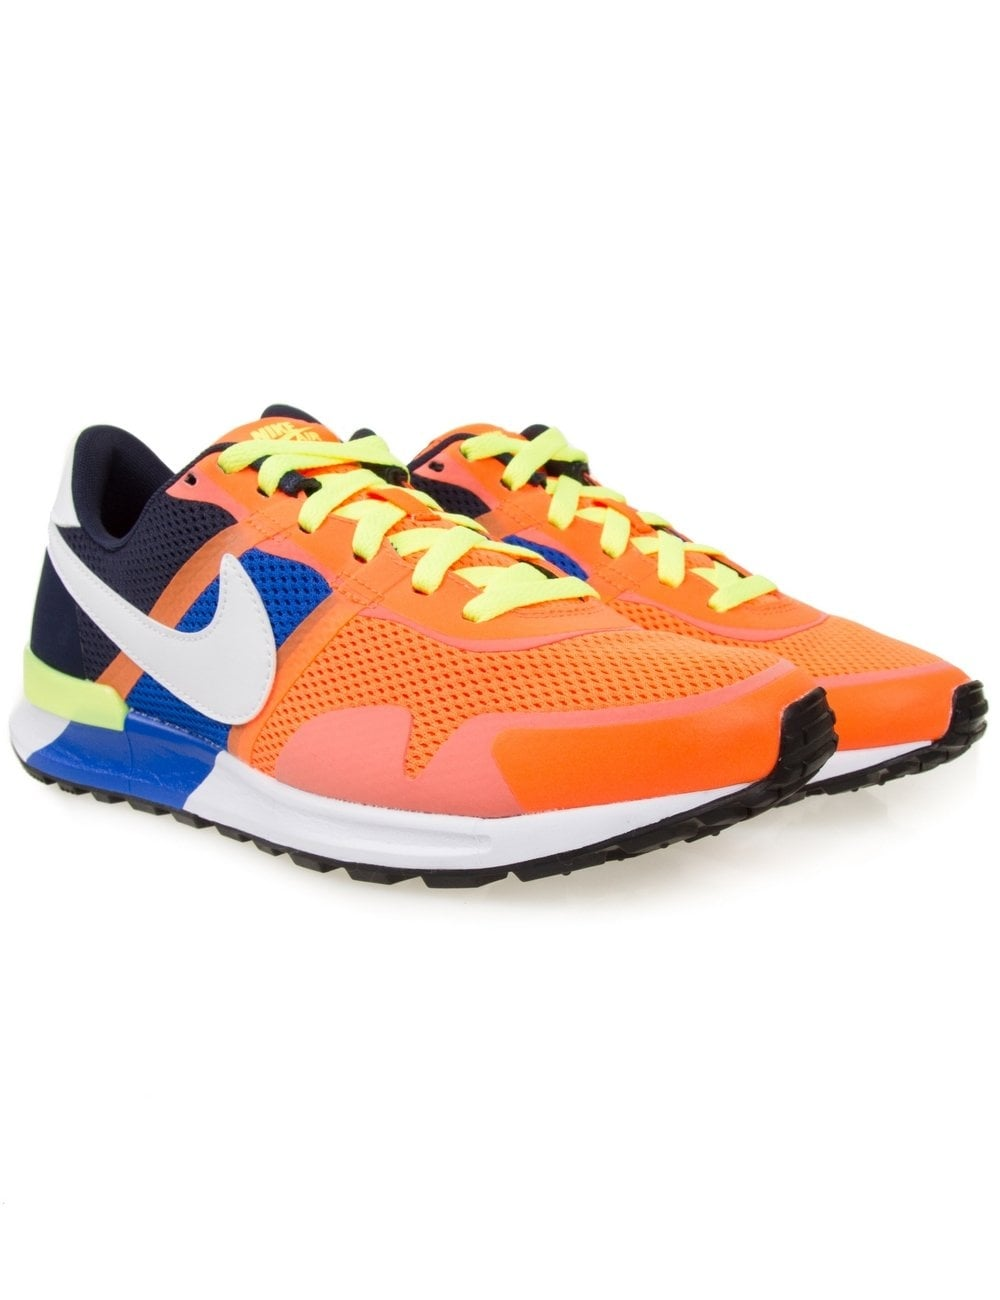 Saltar carpeta Paine Gillic  Nike Air Pegasus 83/30 - Hyper Crimson - Footwear from Fat Buddha Store UK